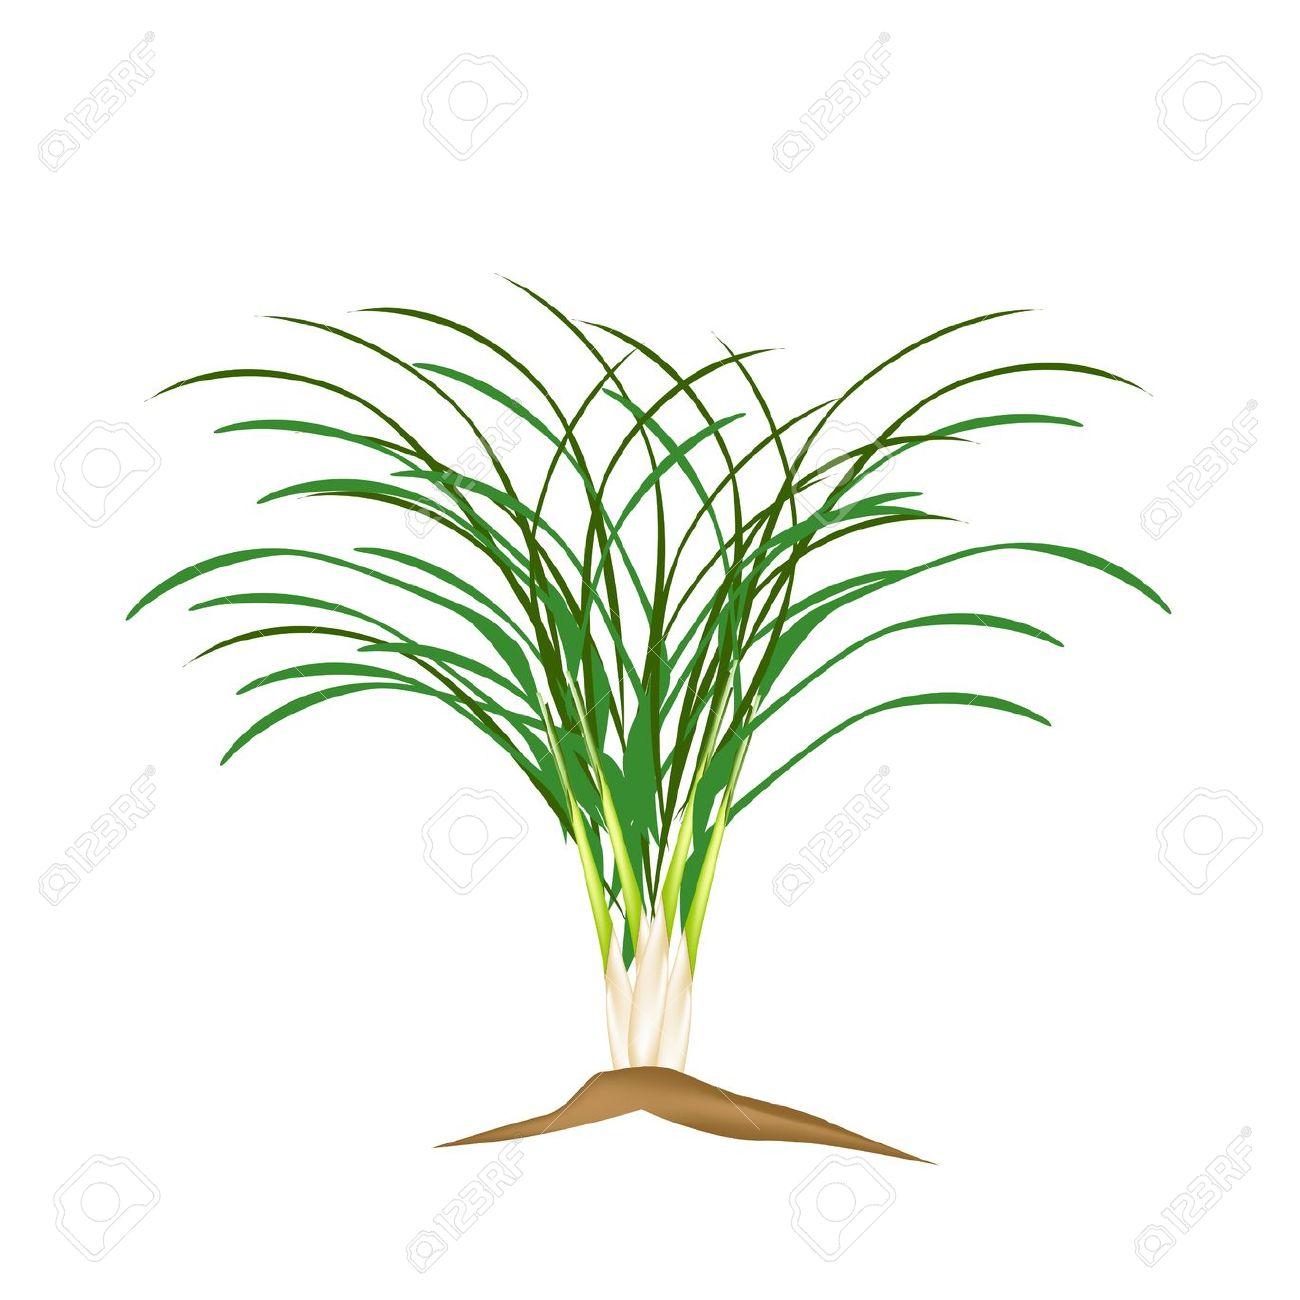 Vegetable And Herb, Vector Illustration Of A Fresh Lemon Grass.